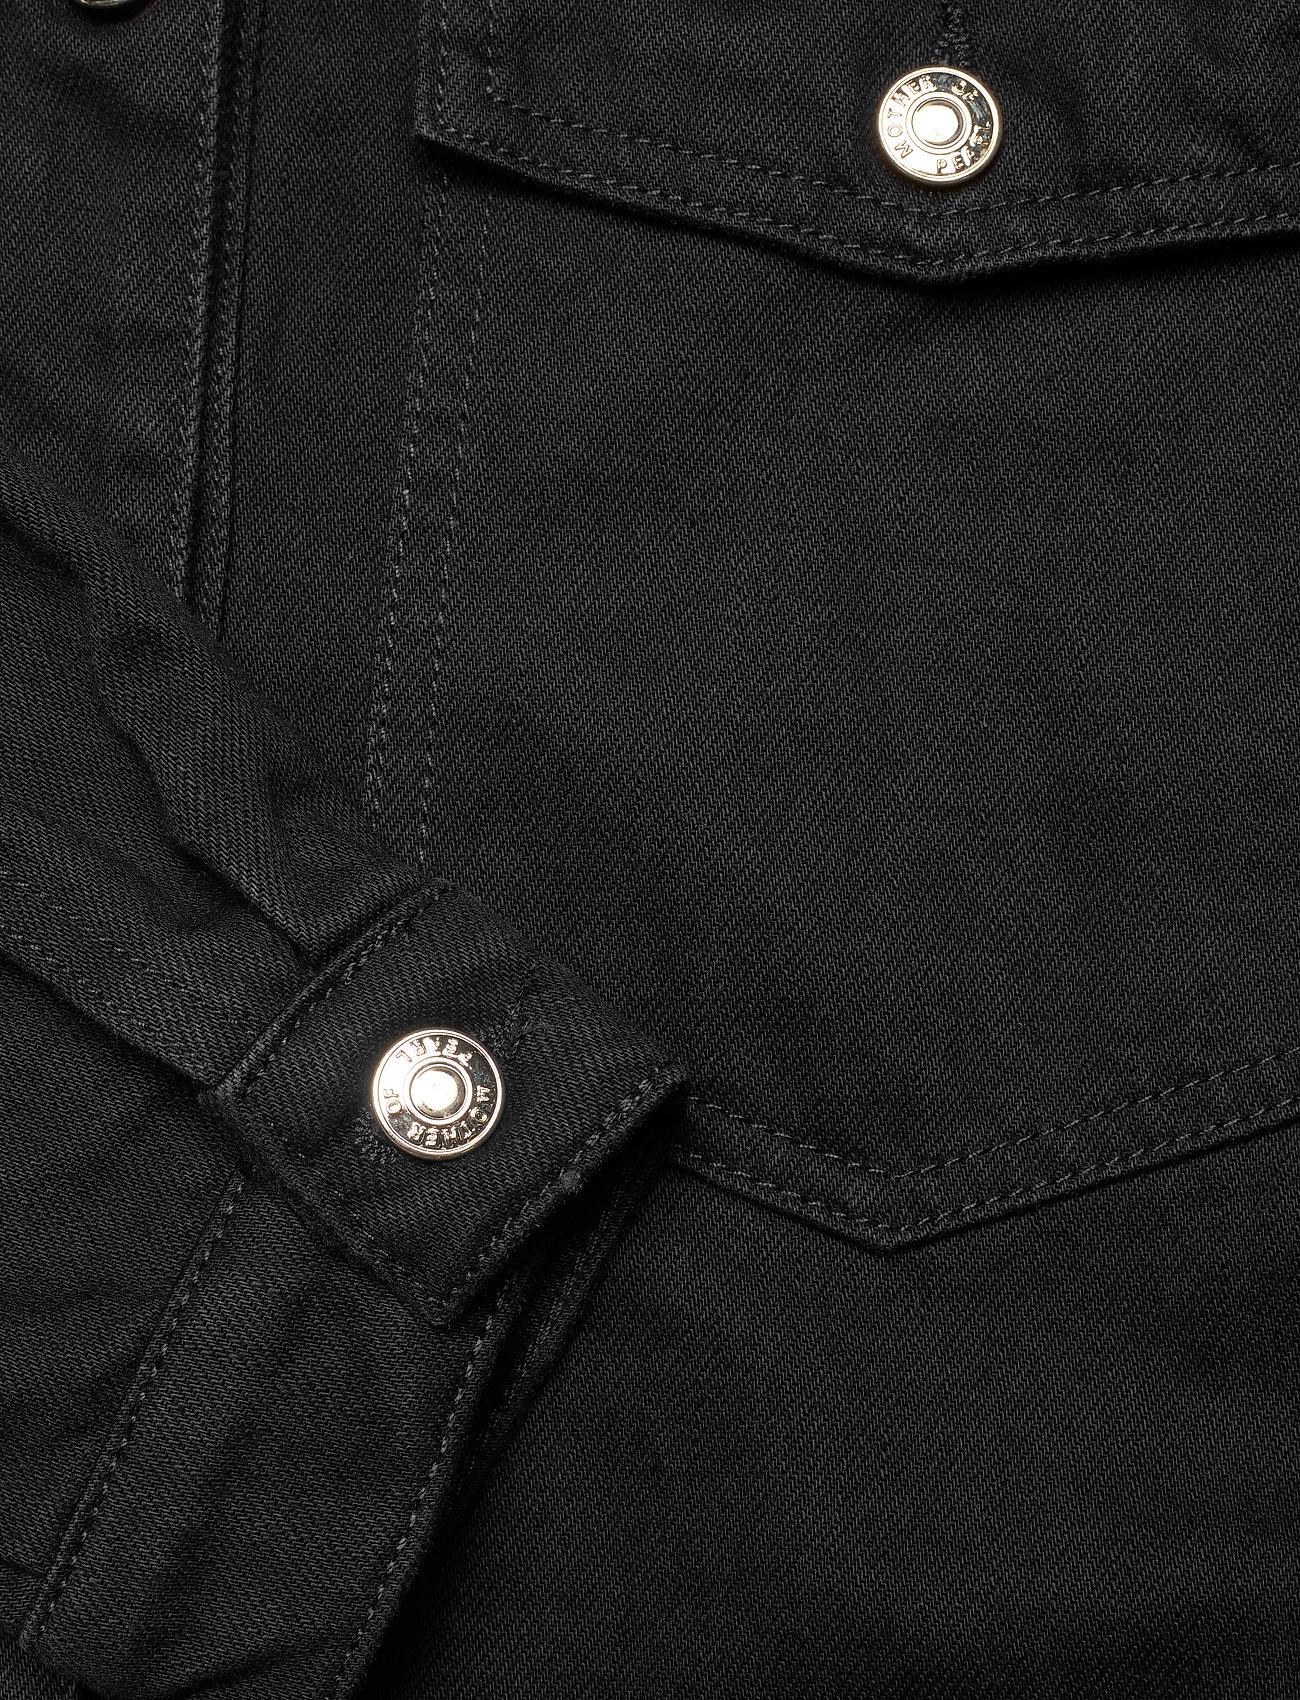 Mother of Pearl - BRENNON DENIM JACKET - spijkerjassen - black - 3